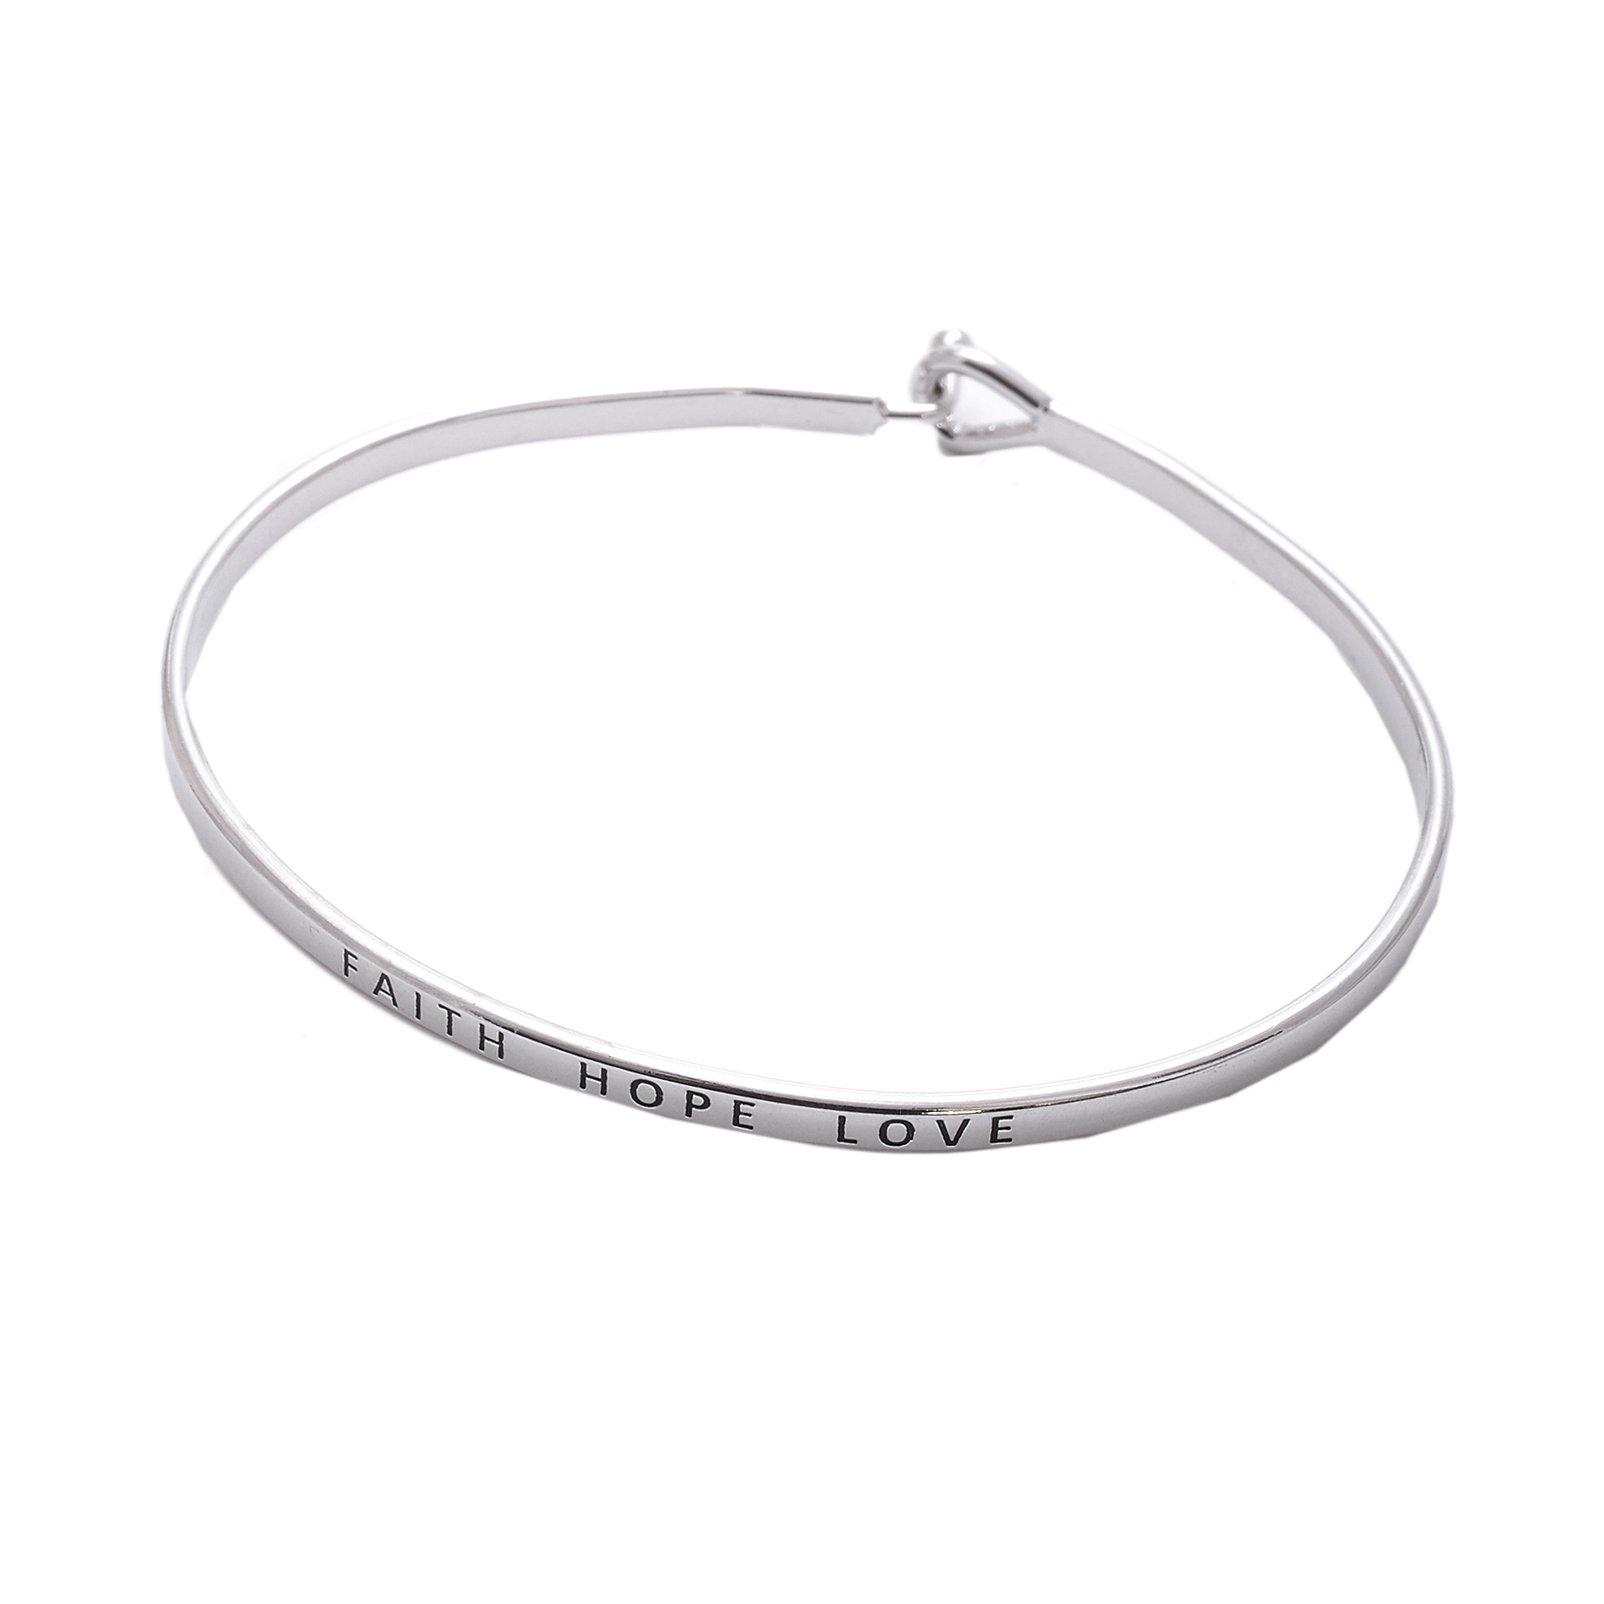 Spinningdaisy Personal Mantra Message Cuff Hook Bracelet (FAITH HOPE LOVE-Silver)